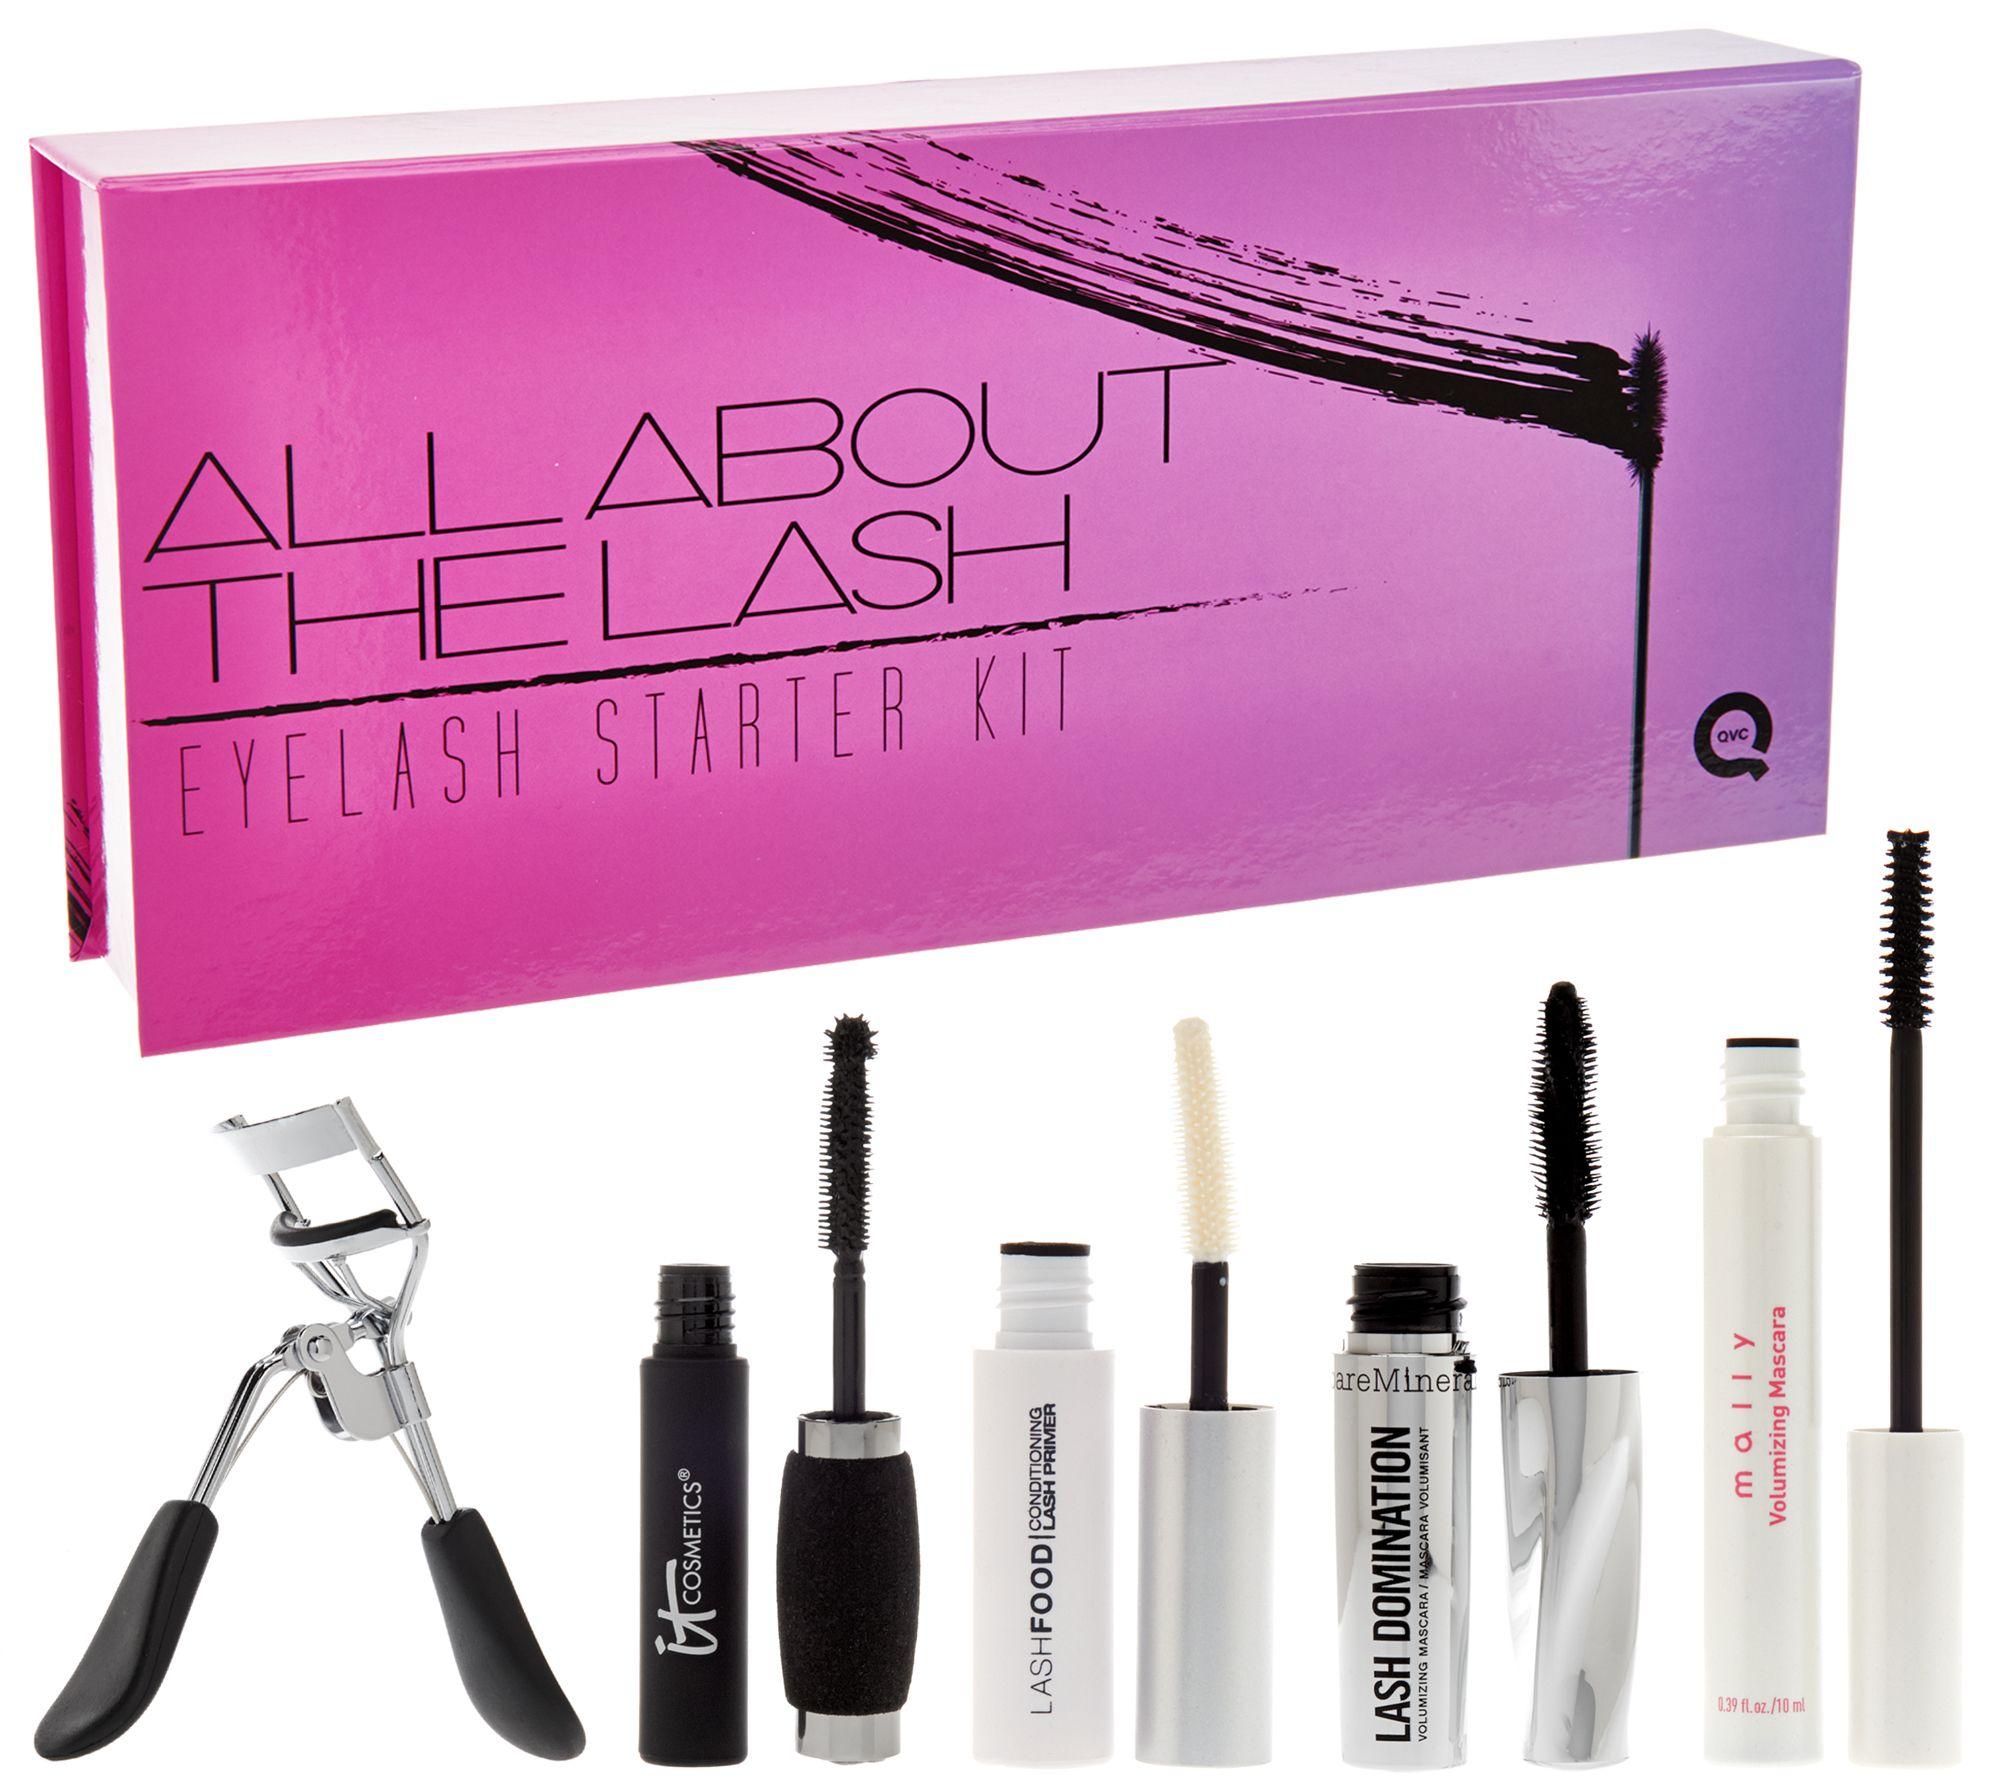 Qvc Beauty All About The Lash Eyelash Starter Kit Page 1 Qvc